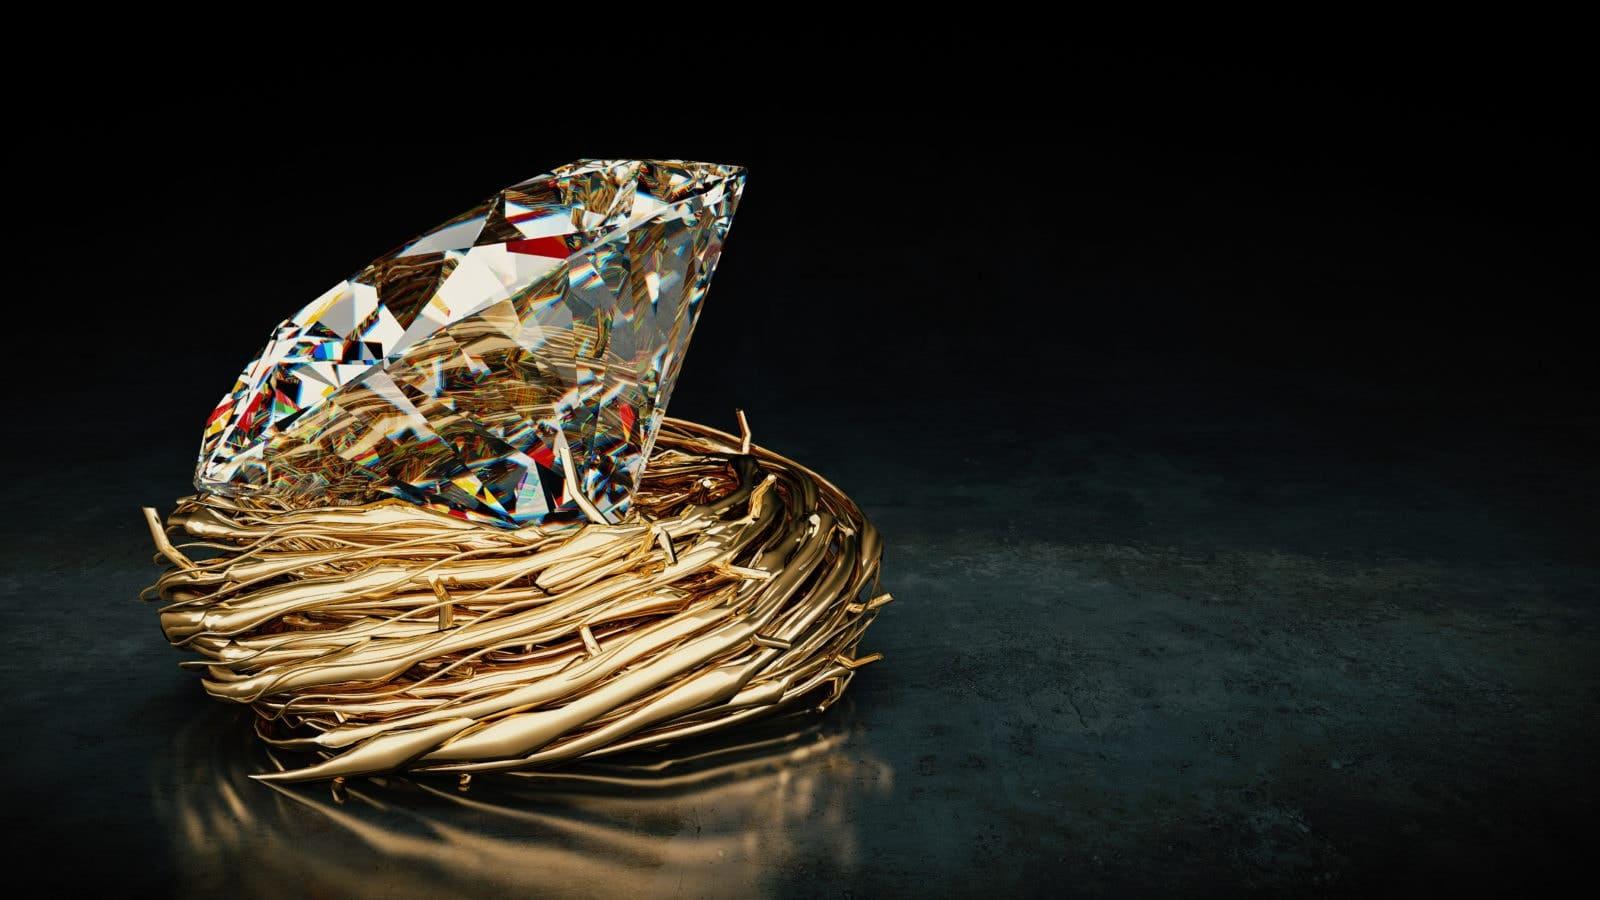 The Precious Diamond  Indian Folklore  It's Time To Meditate. Shield Diamond. Diamond Gemstone. Lavender Diamond. Bird Watches. Branded Watches. Keepsake Engagement Rings. Hexagon Rings. Conflict Free Diamond Engagement Rings